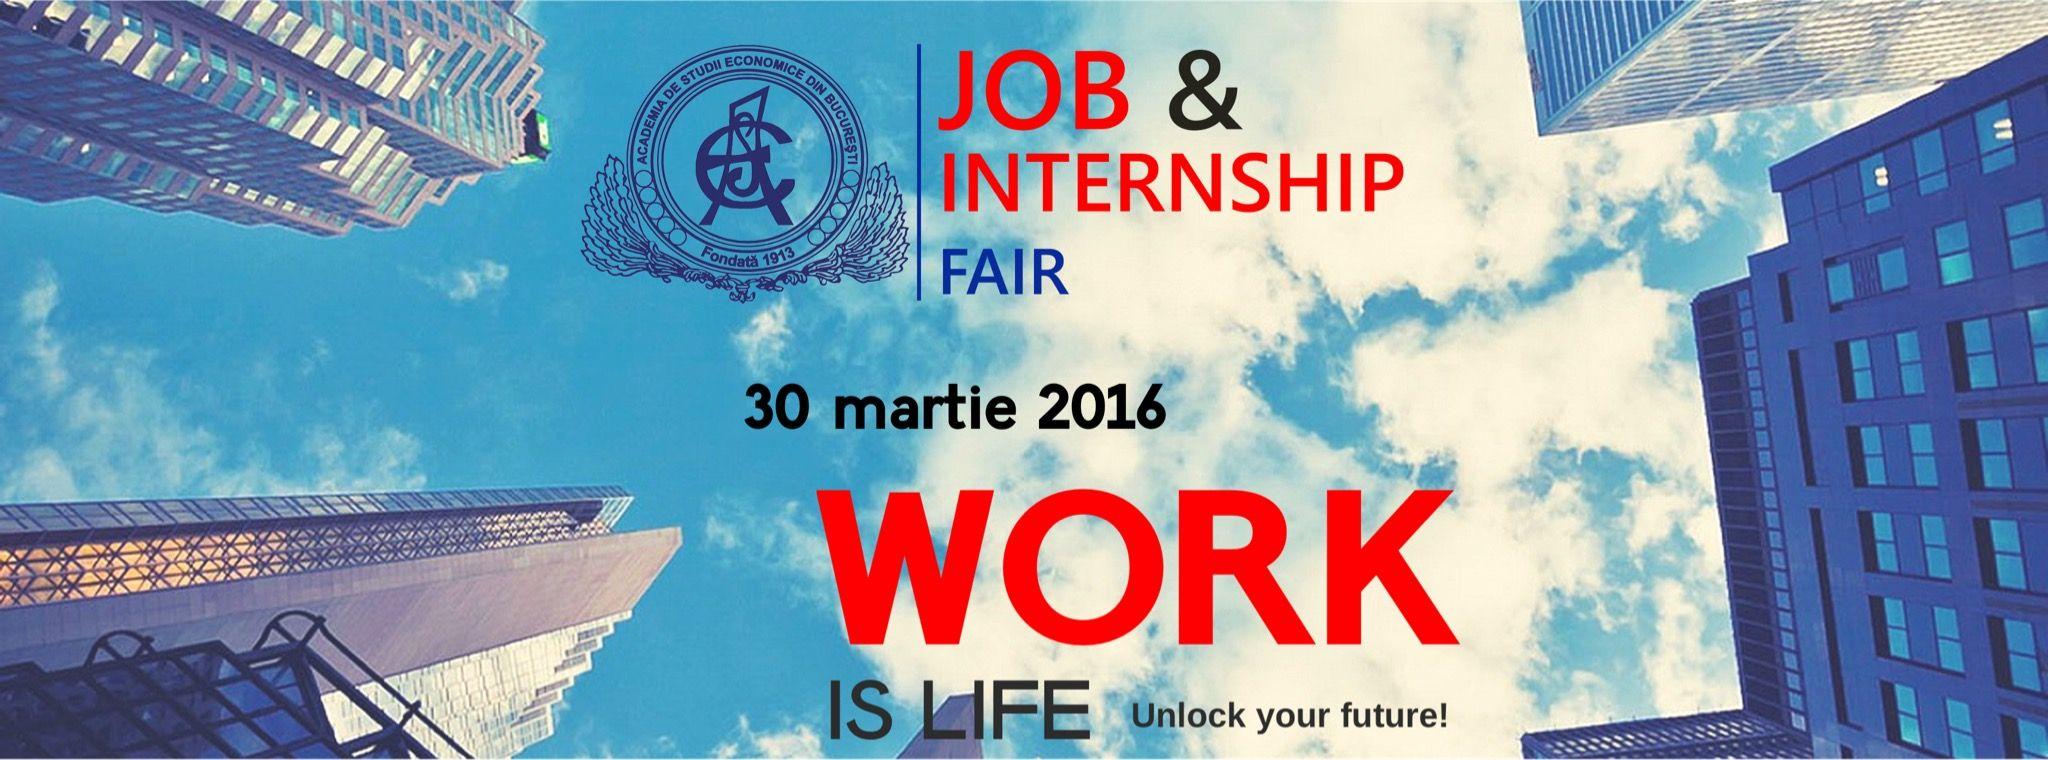 ASE Job & Internship Fair 2016